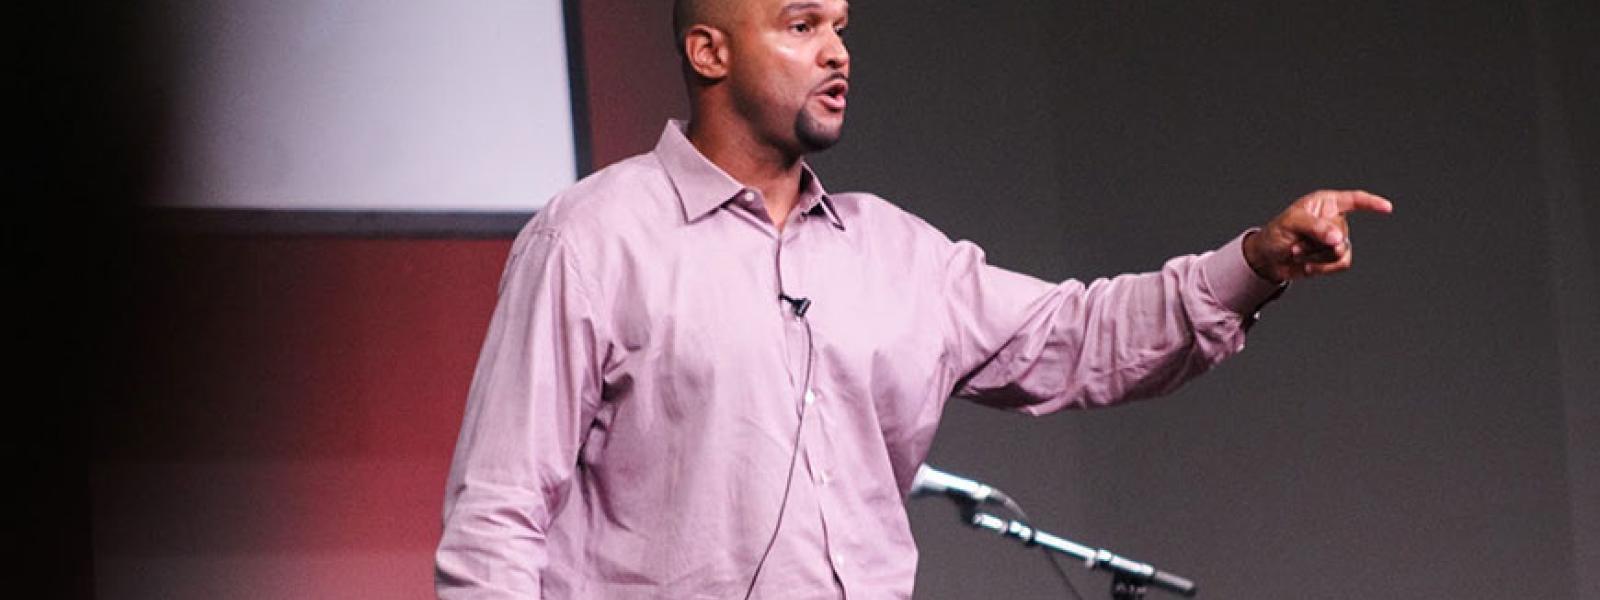 Michael Boulware speaks in CIU's Shortess Chapel.